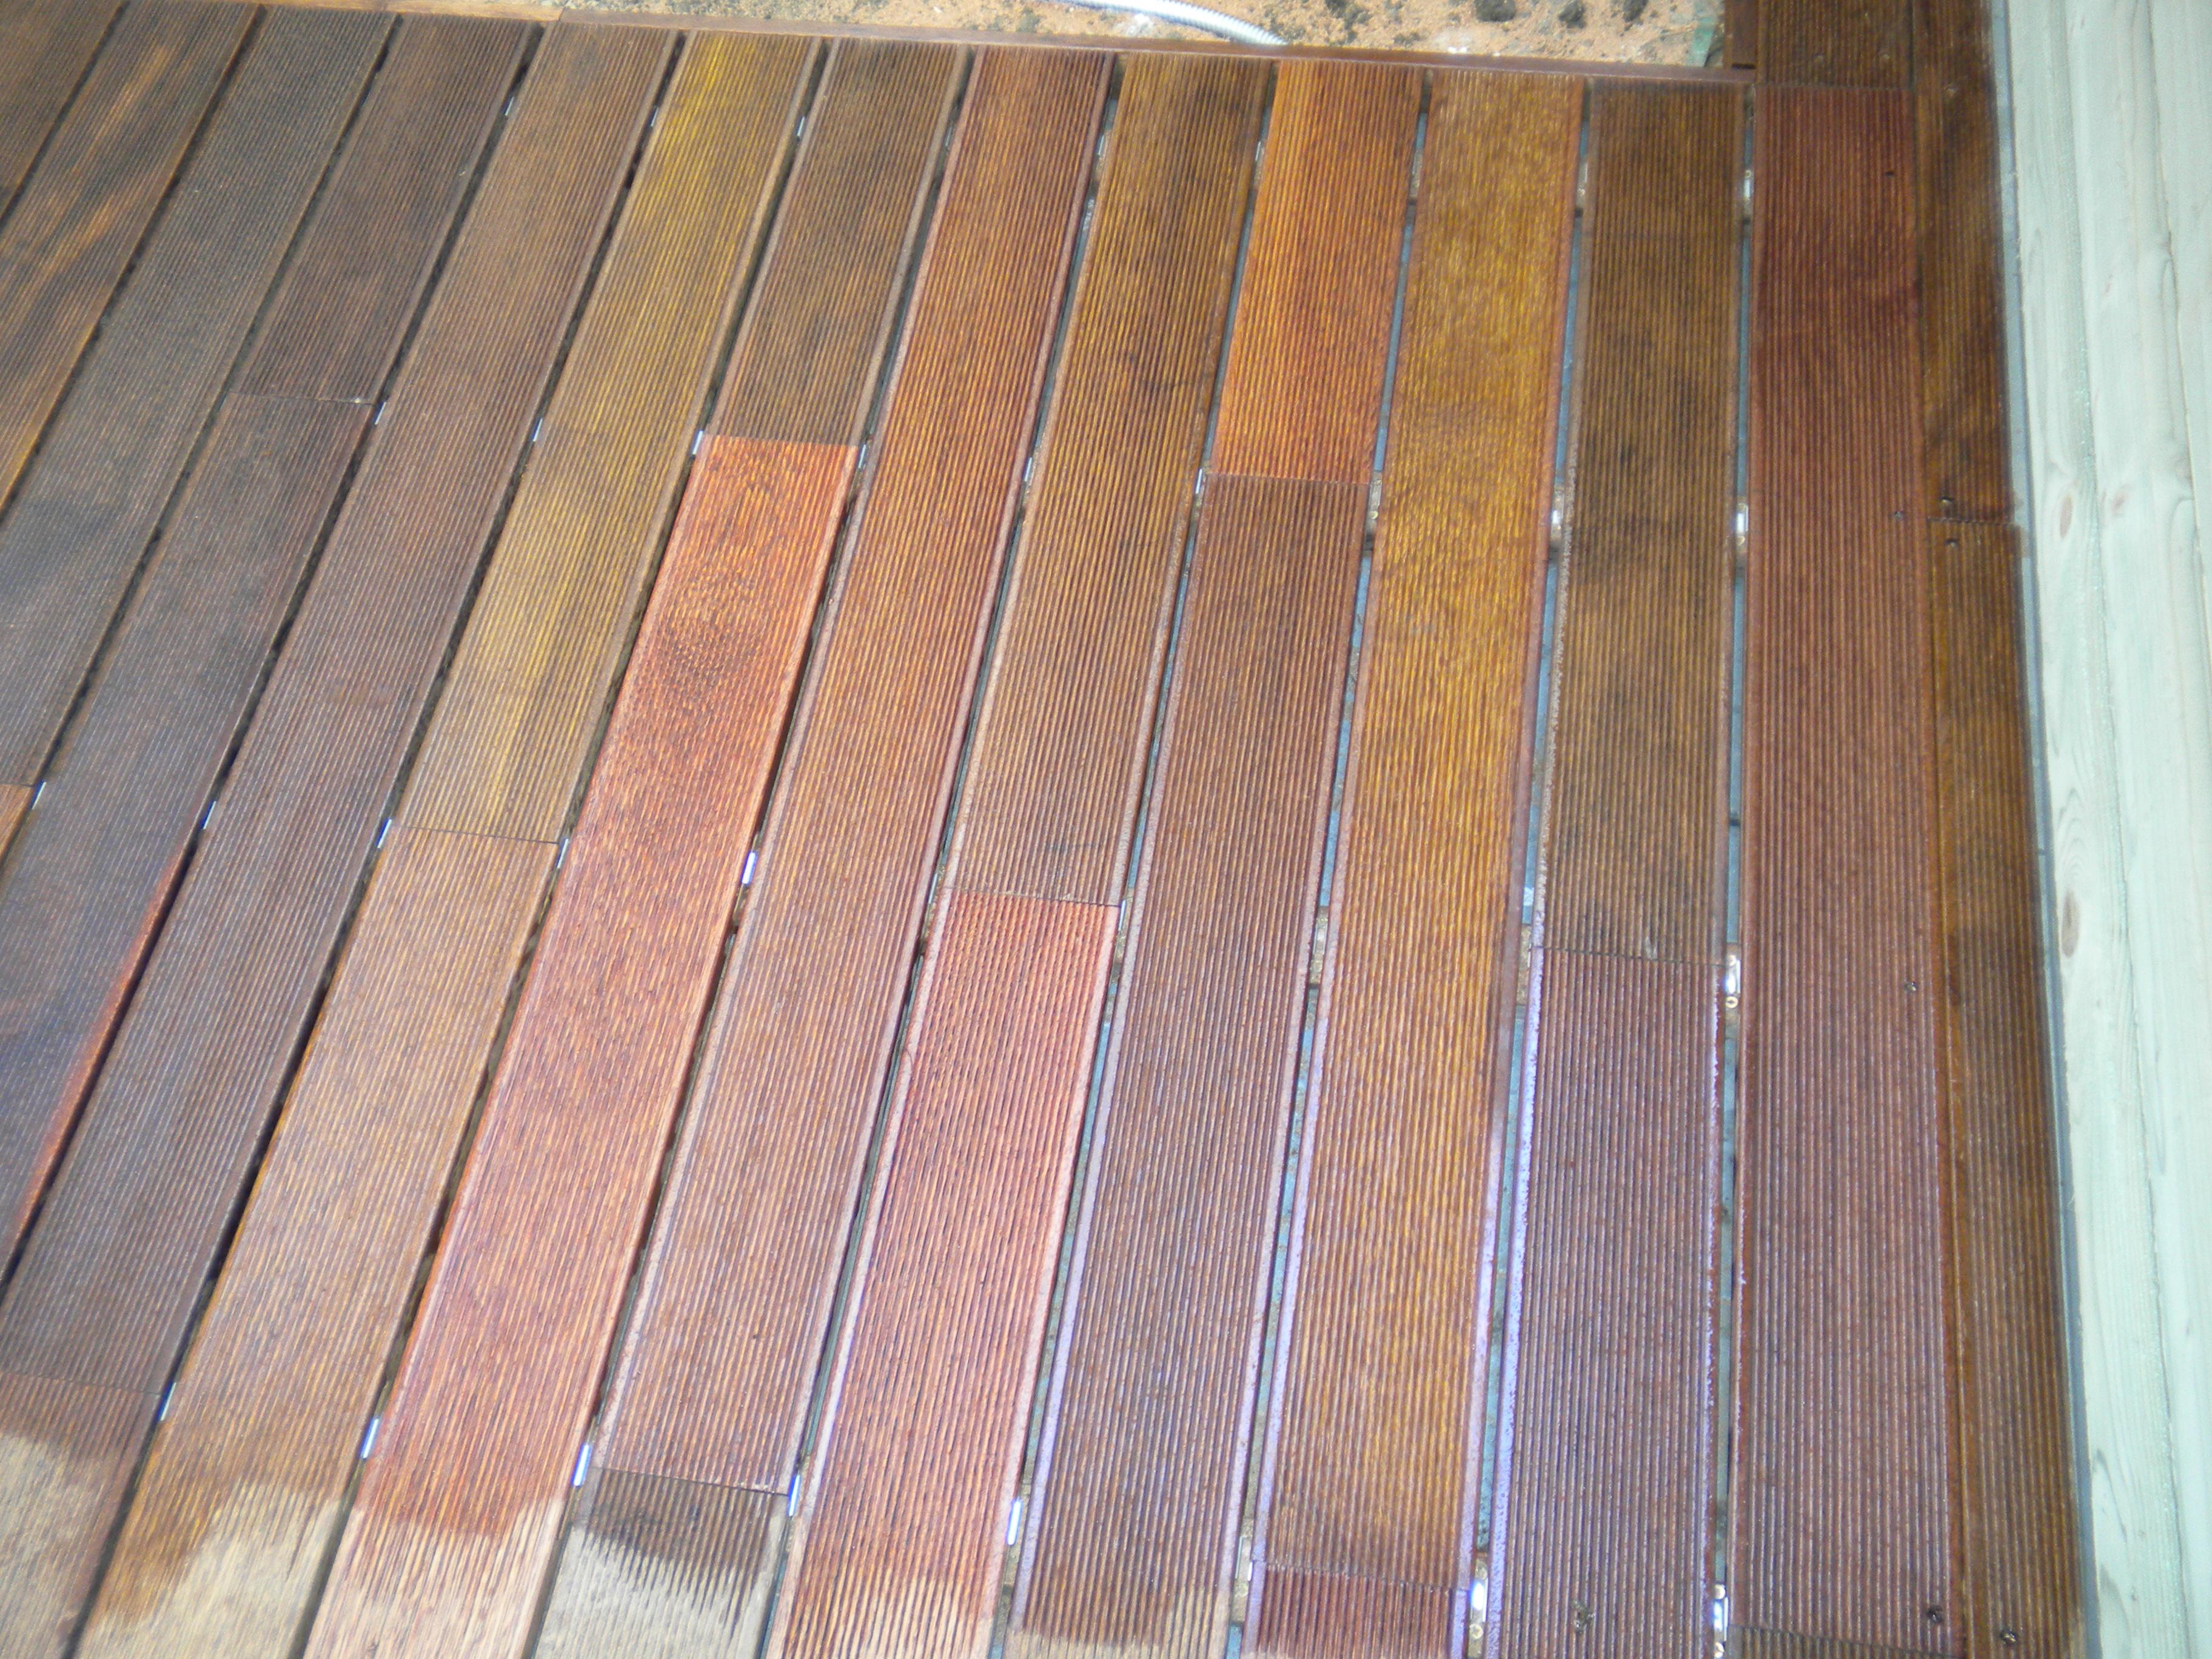 Deck-uri lemn - Sucupira Red SELVA FLOORS - Poza 34